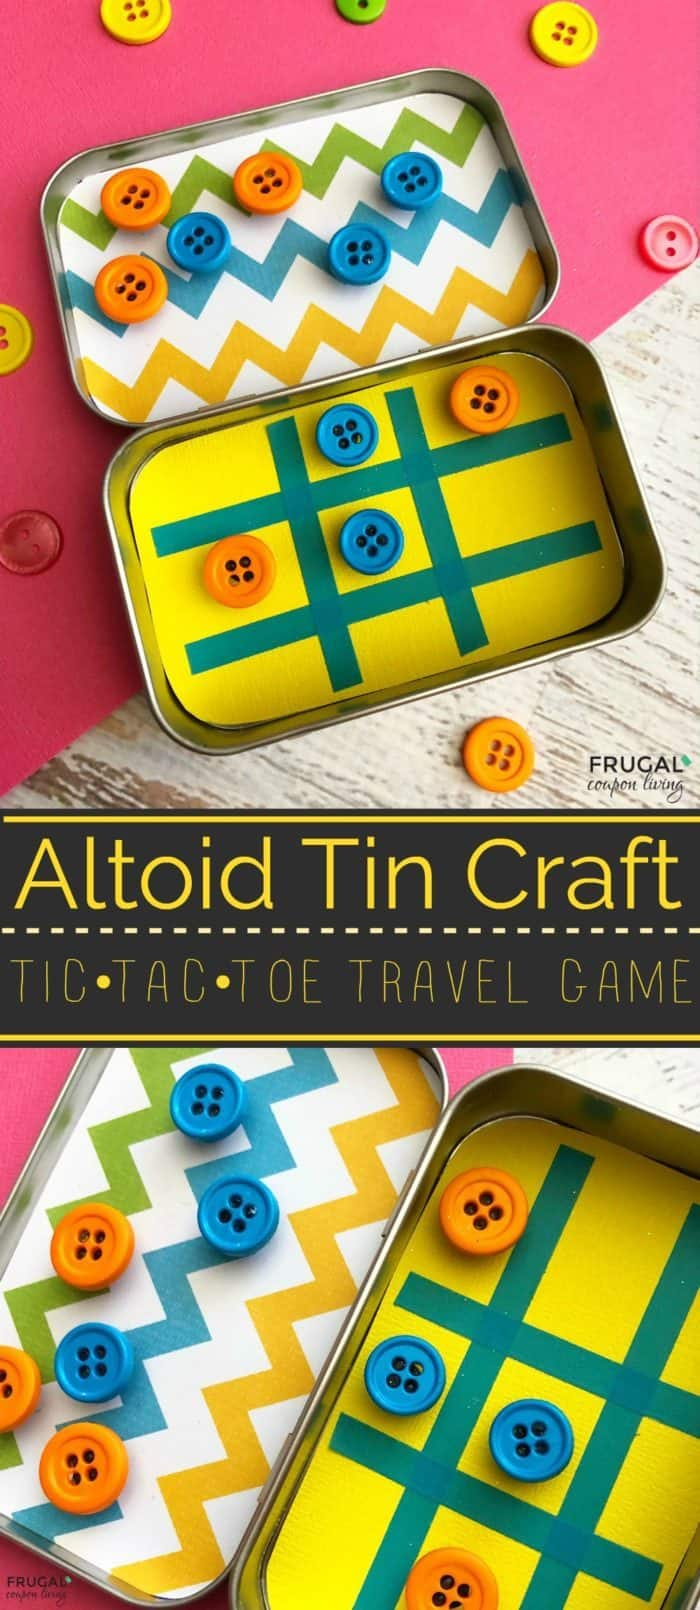 Altoid Tin Craft - Tic Tac Toe Travel Game